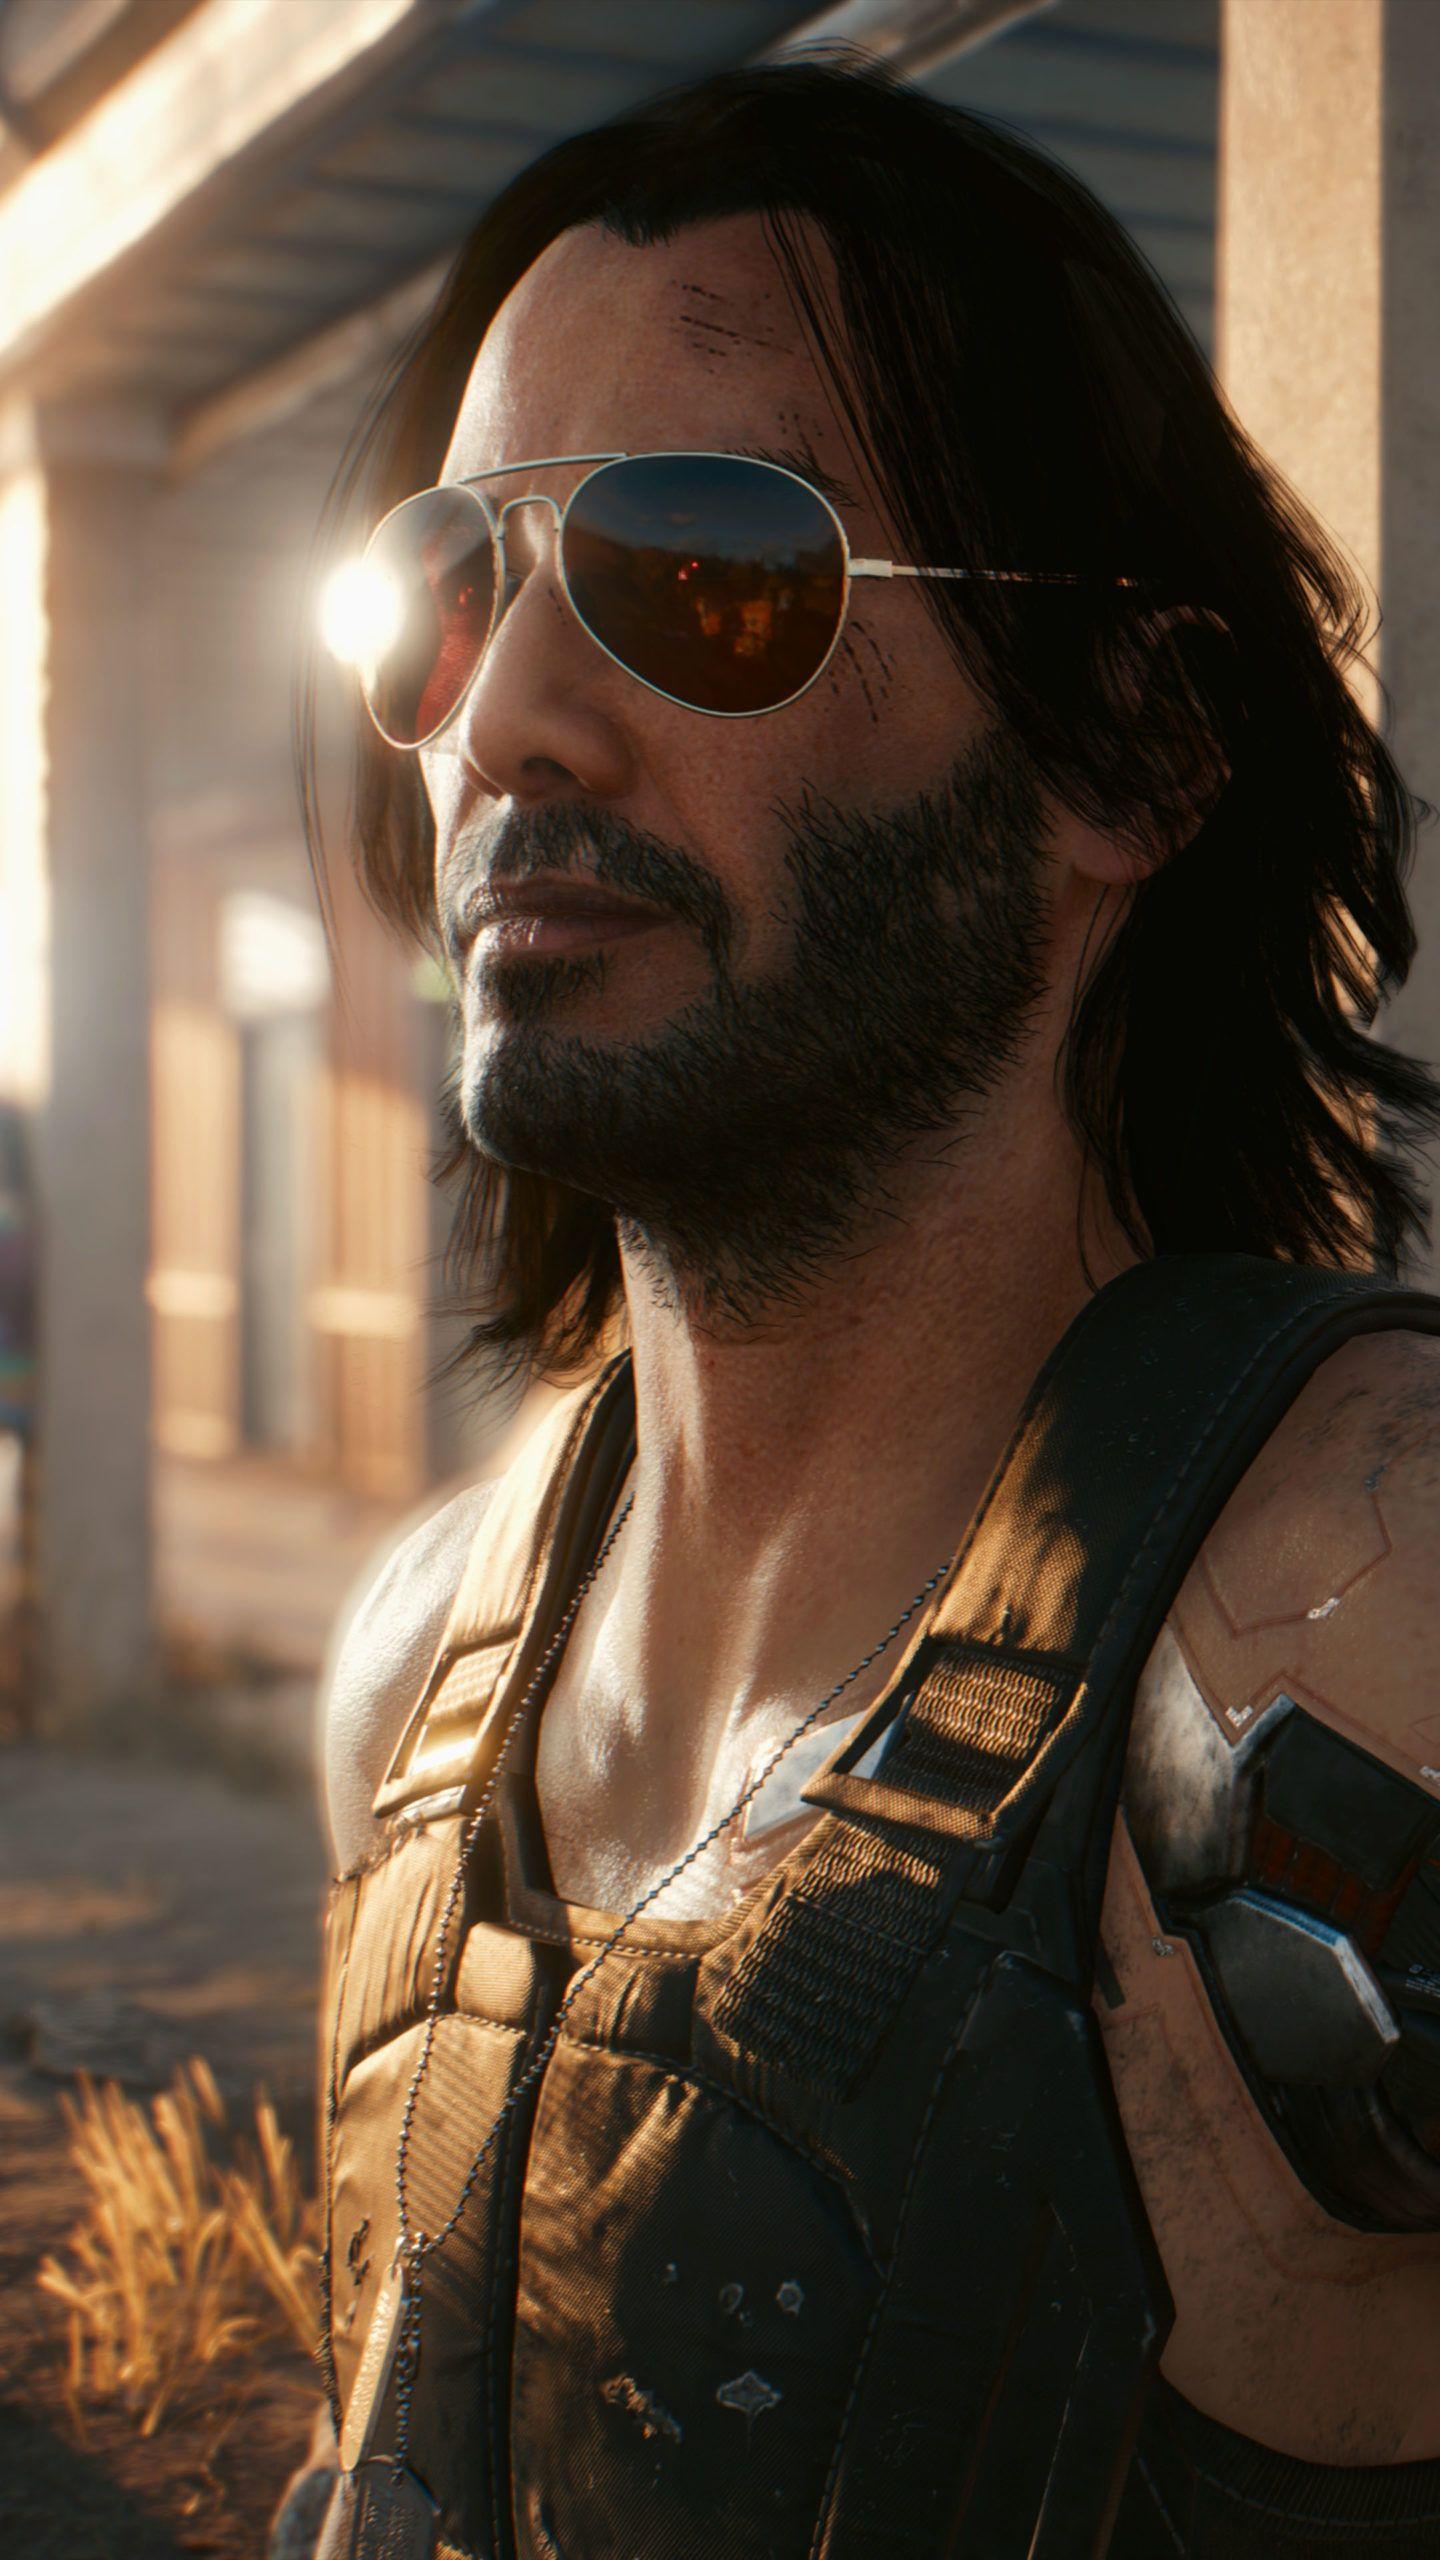 Keanu Reeves Cyberpunk 2077 2020 4K ...